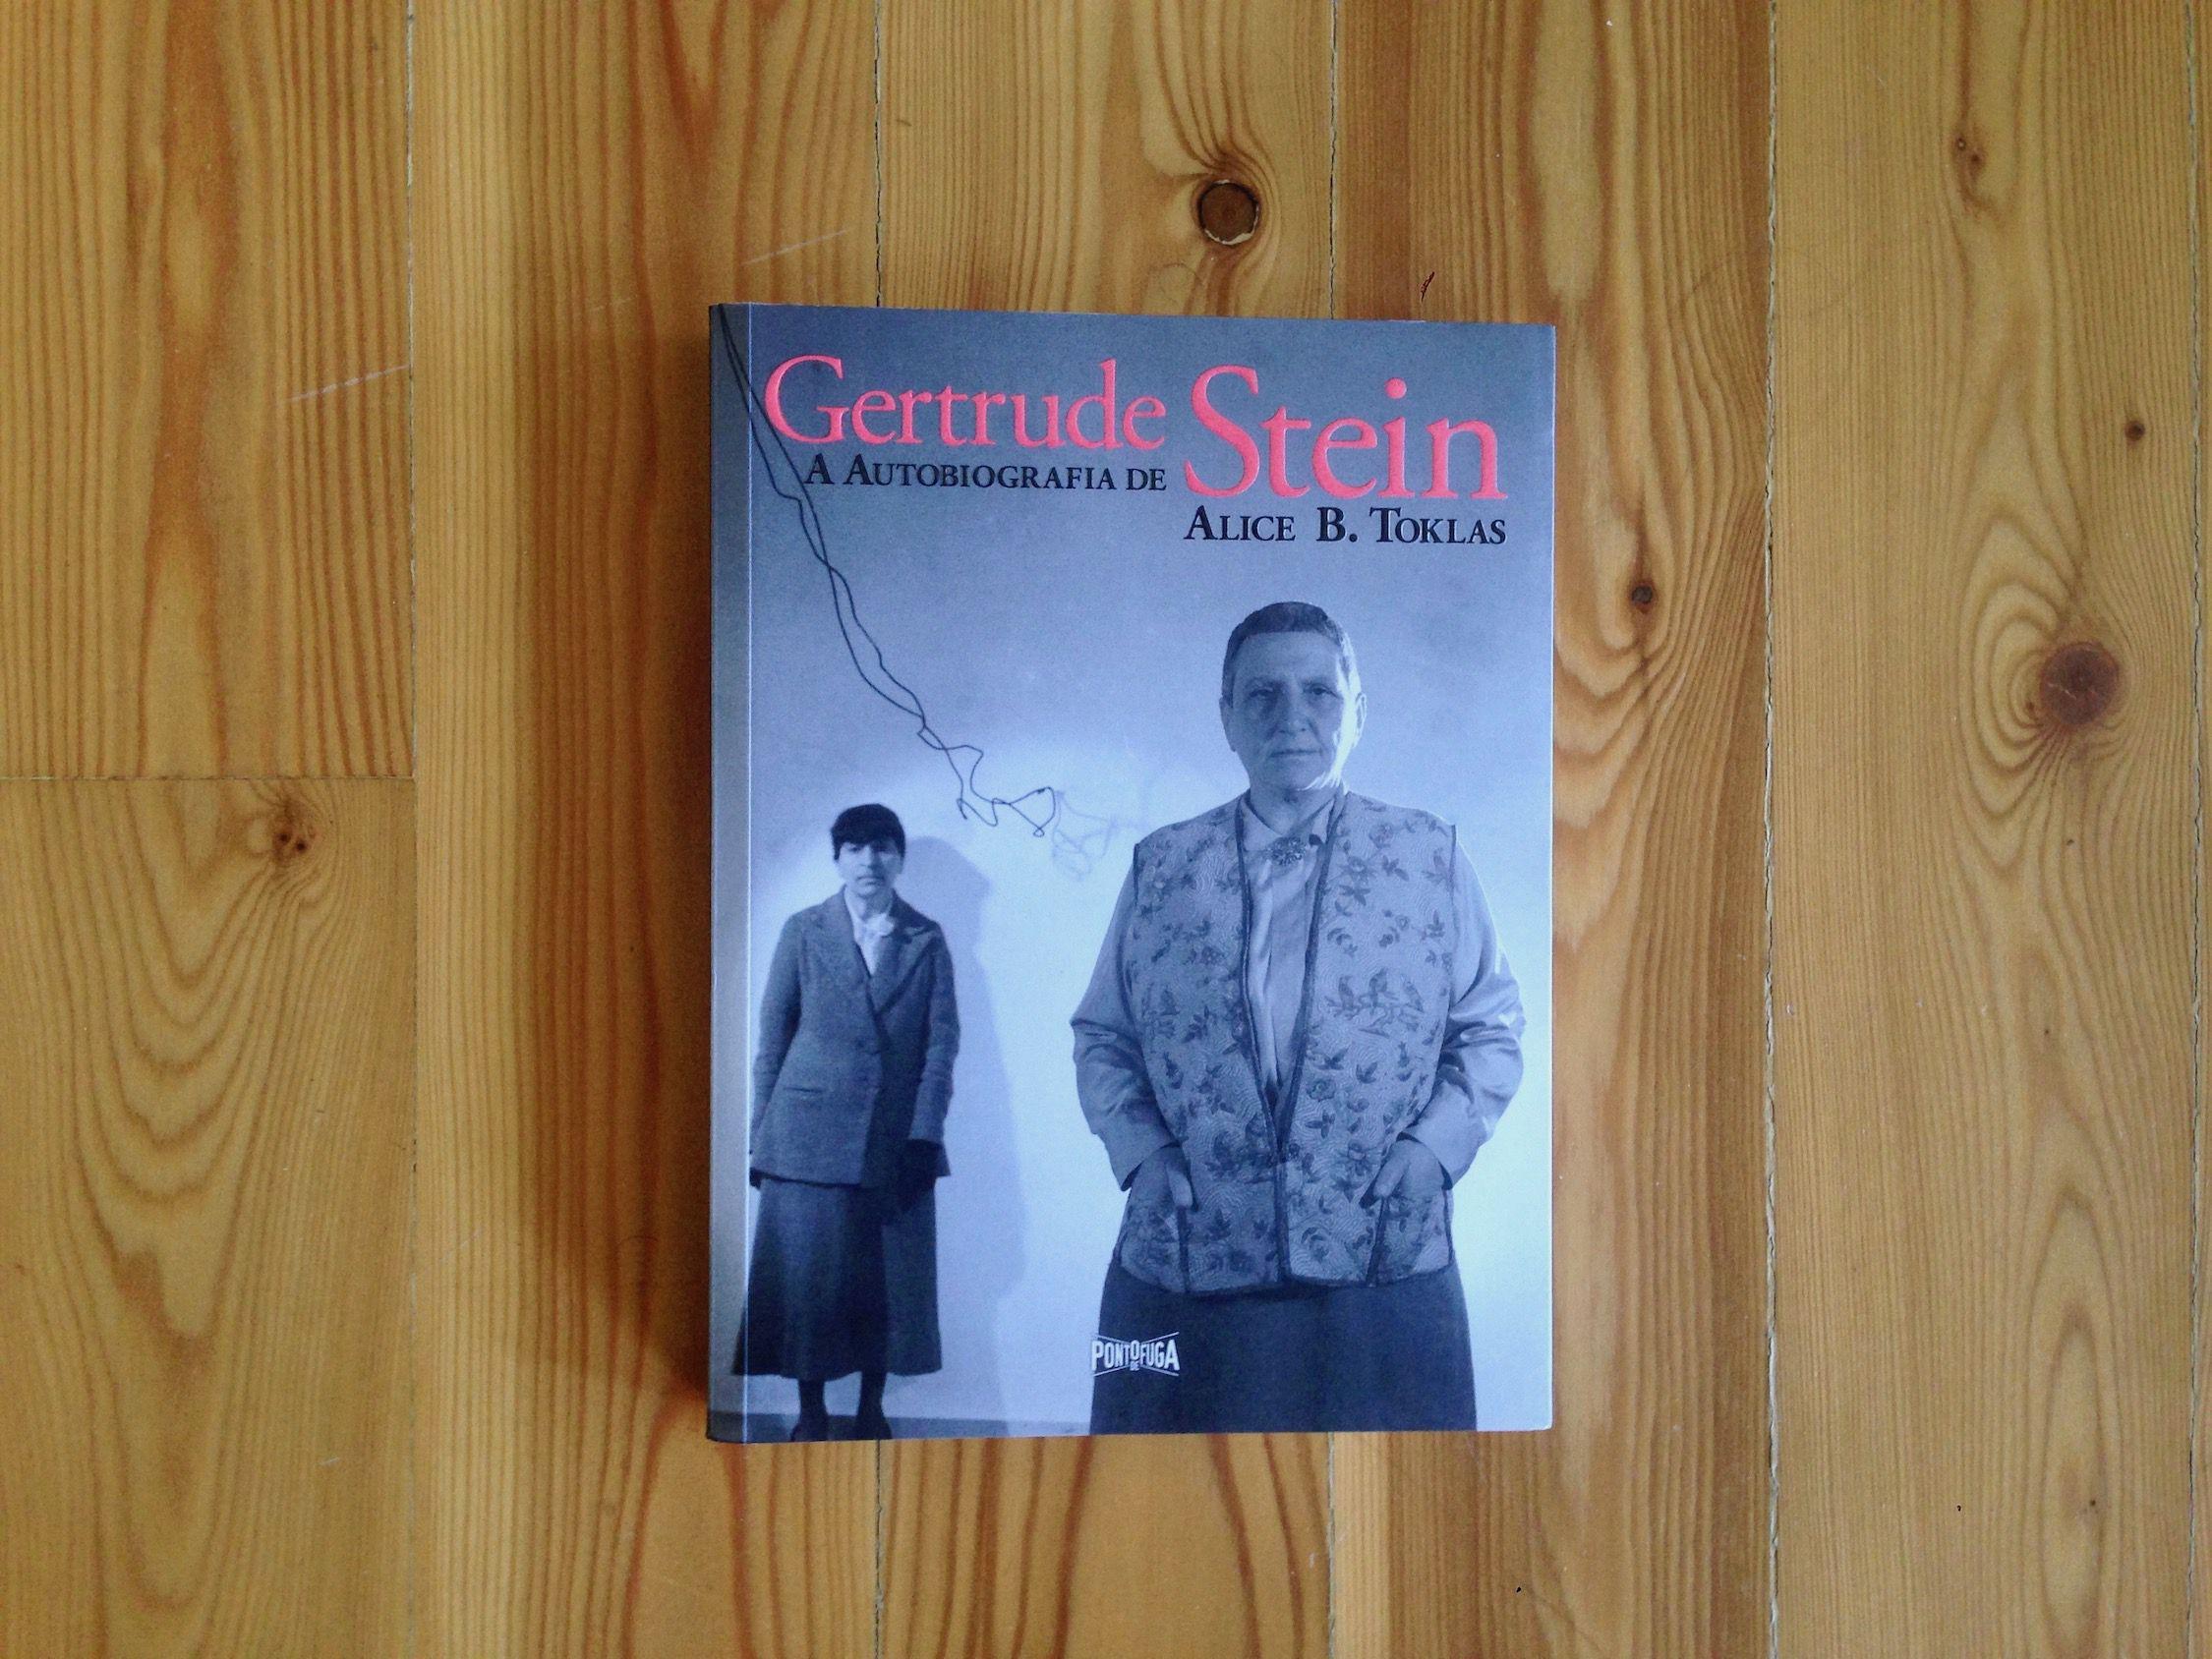 As vidas dos artistas famosos ao longo de 'A Autobiografia de Alice B. Toklas', de Gertrude Stein